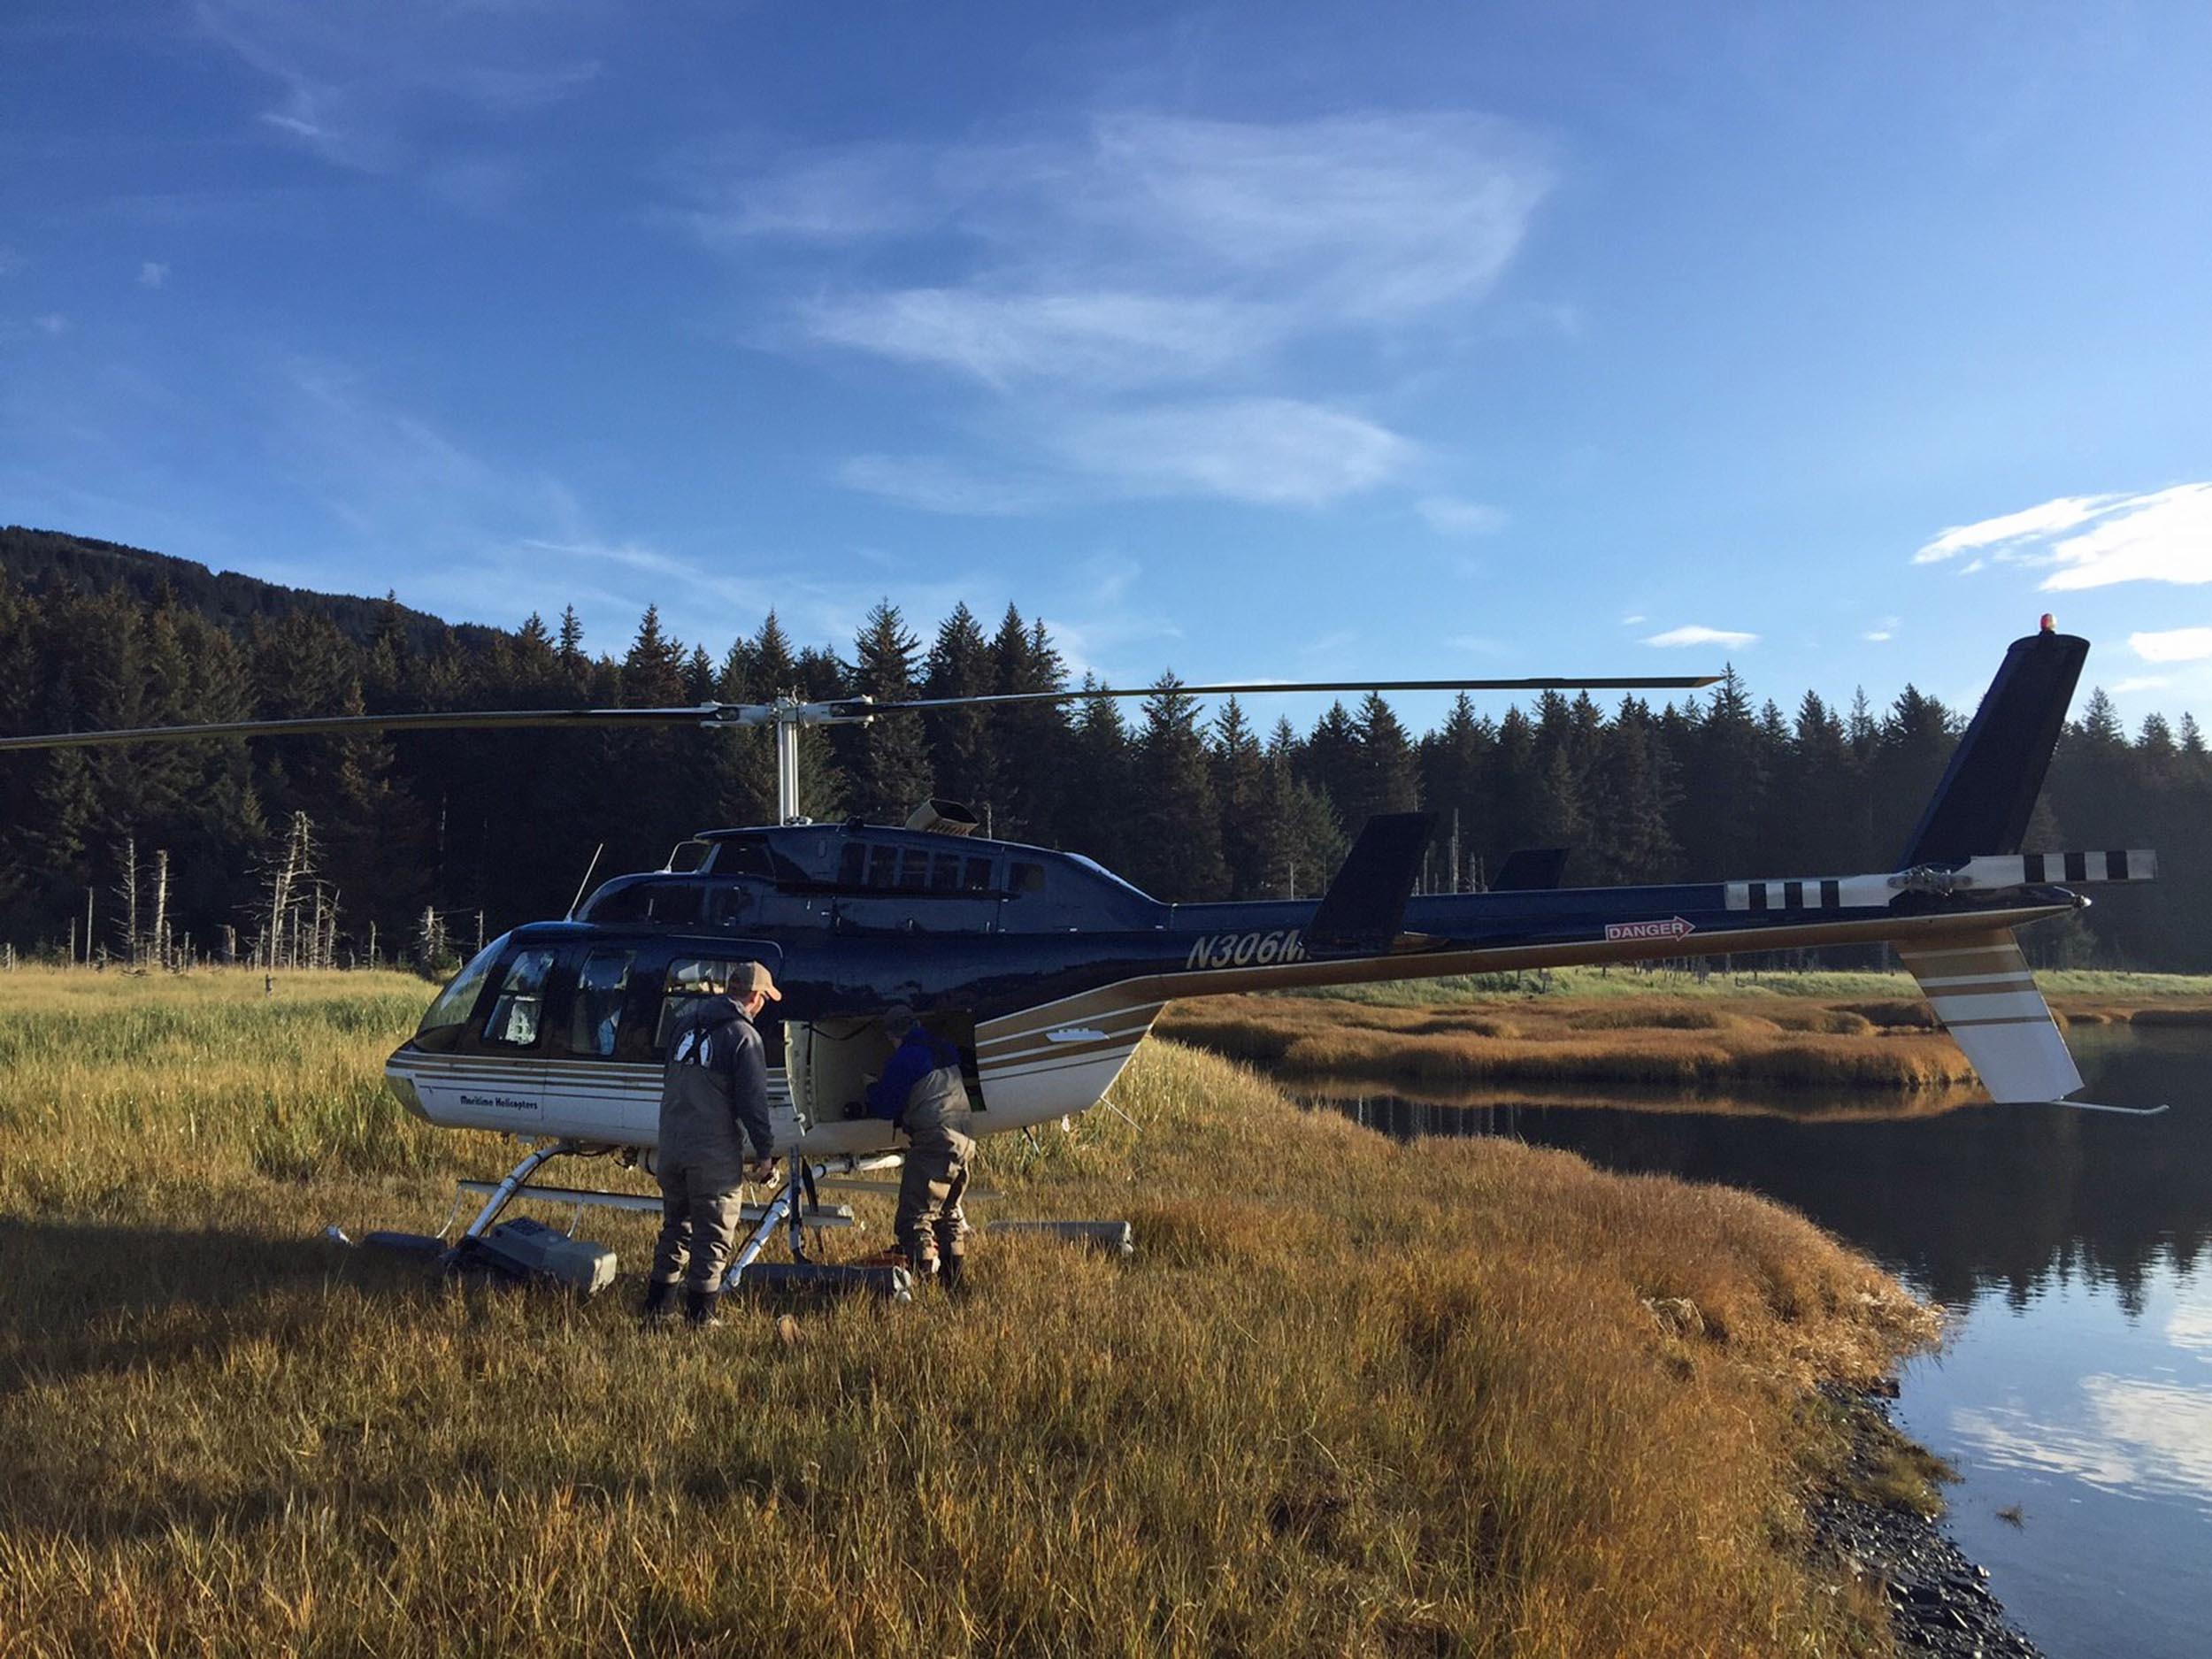 Bell 206 L3